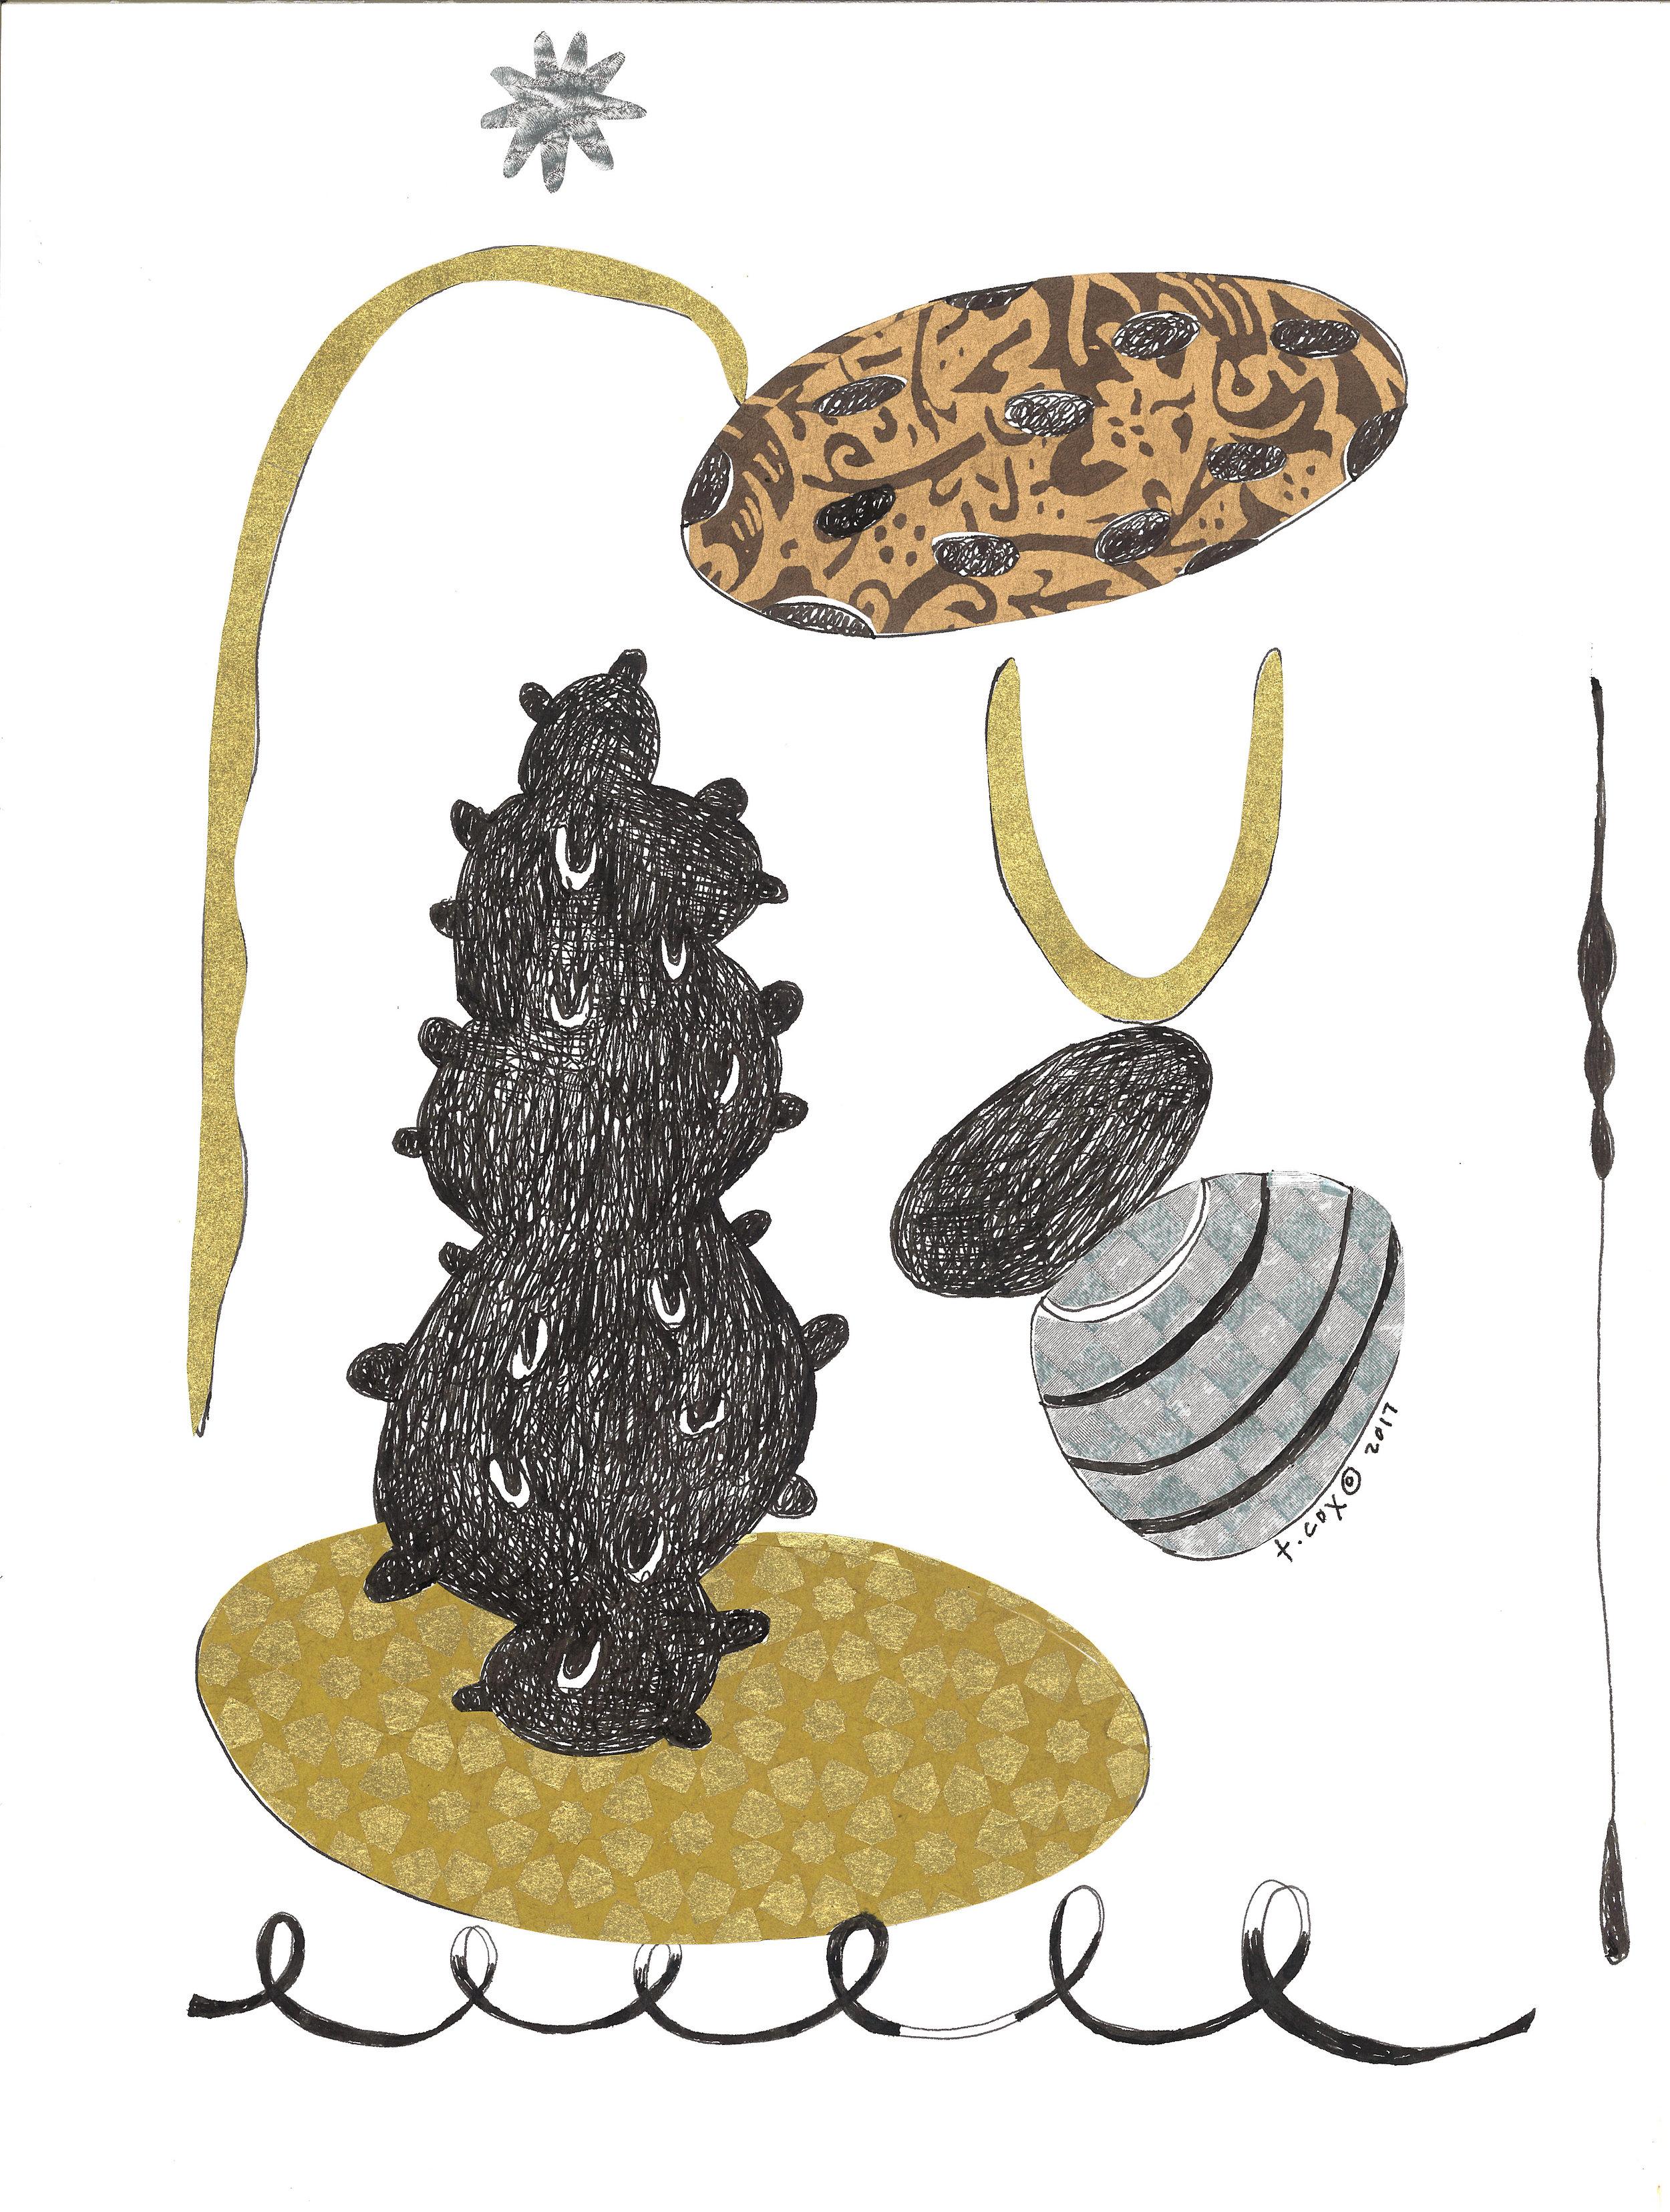 Golden Tumble-Drawing